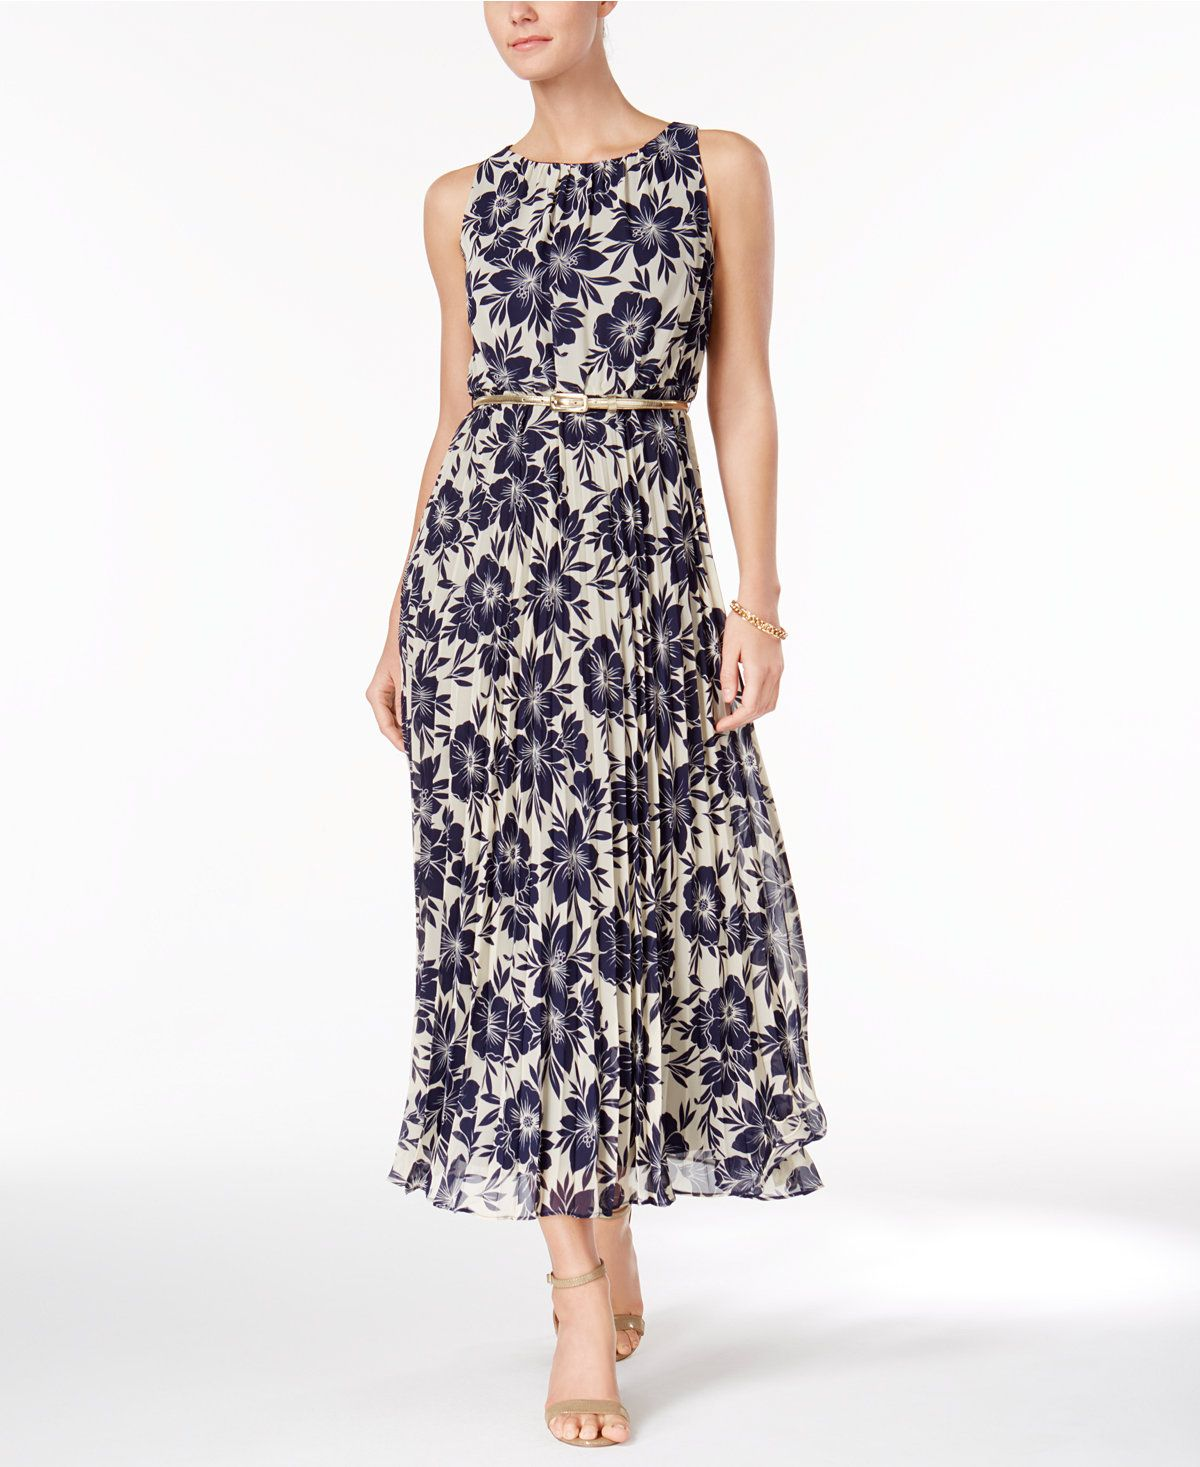 c43188c0bae7 Jessica Howard Petite Chiffon Floral-Print Maxi Dress - Petite Maxi Dress -  SLP - Macy's